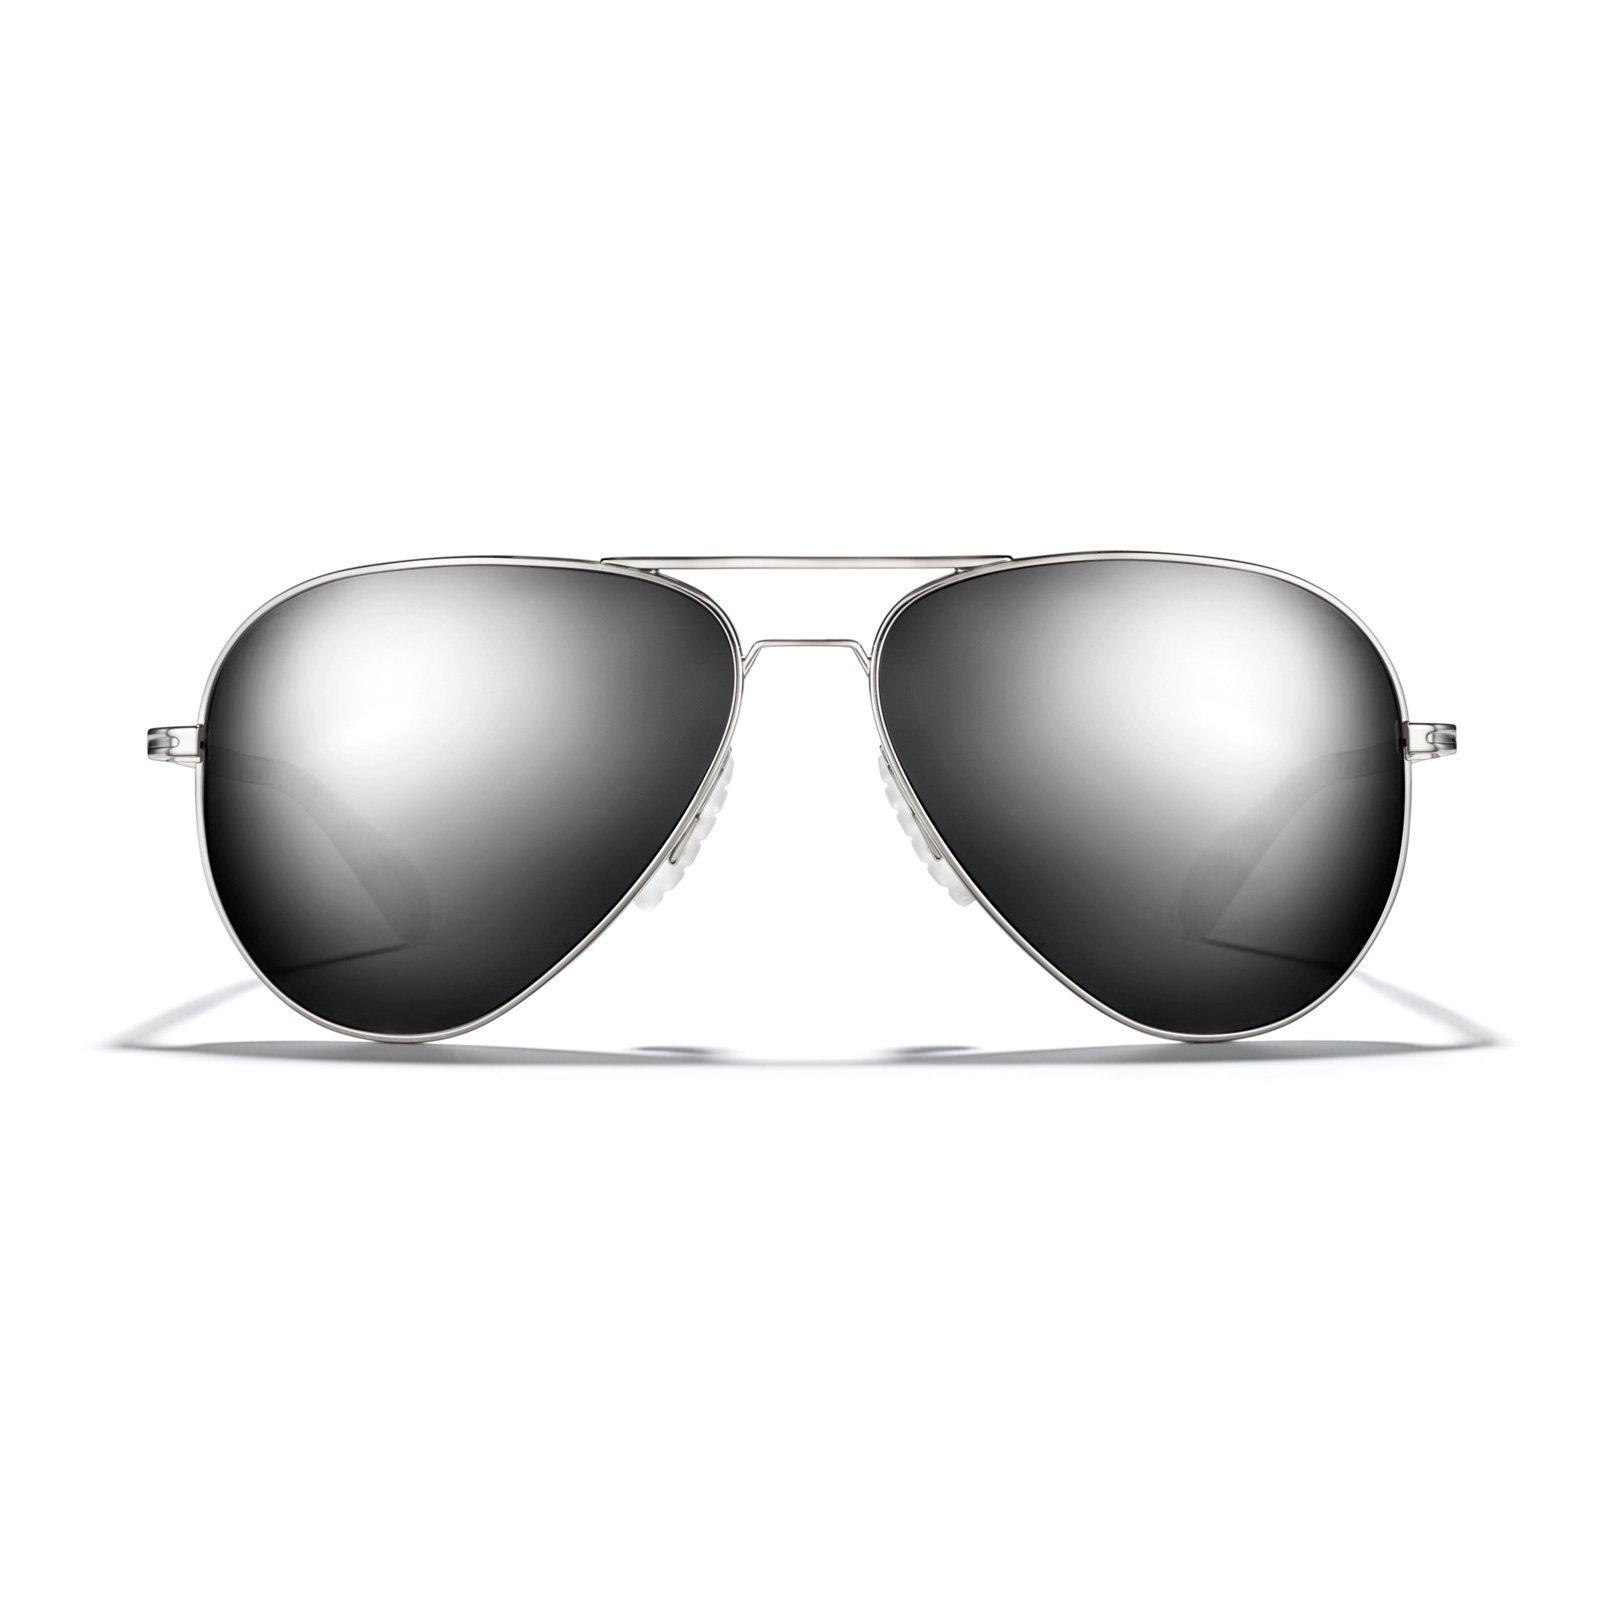 403176d5e7d Galleon - ROKA Phantom Alloy Sports Performance Aviator Non-Polarized  Sunglasses For Men And Women - Silver Frame - Dark Arctic Mirror Lens